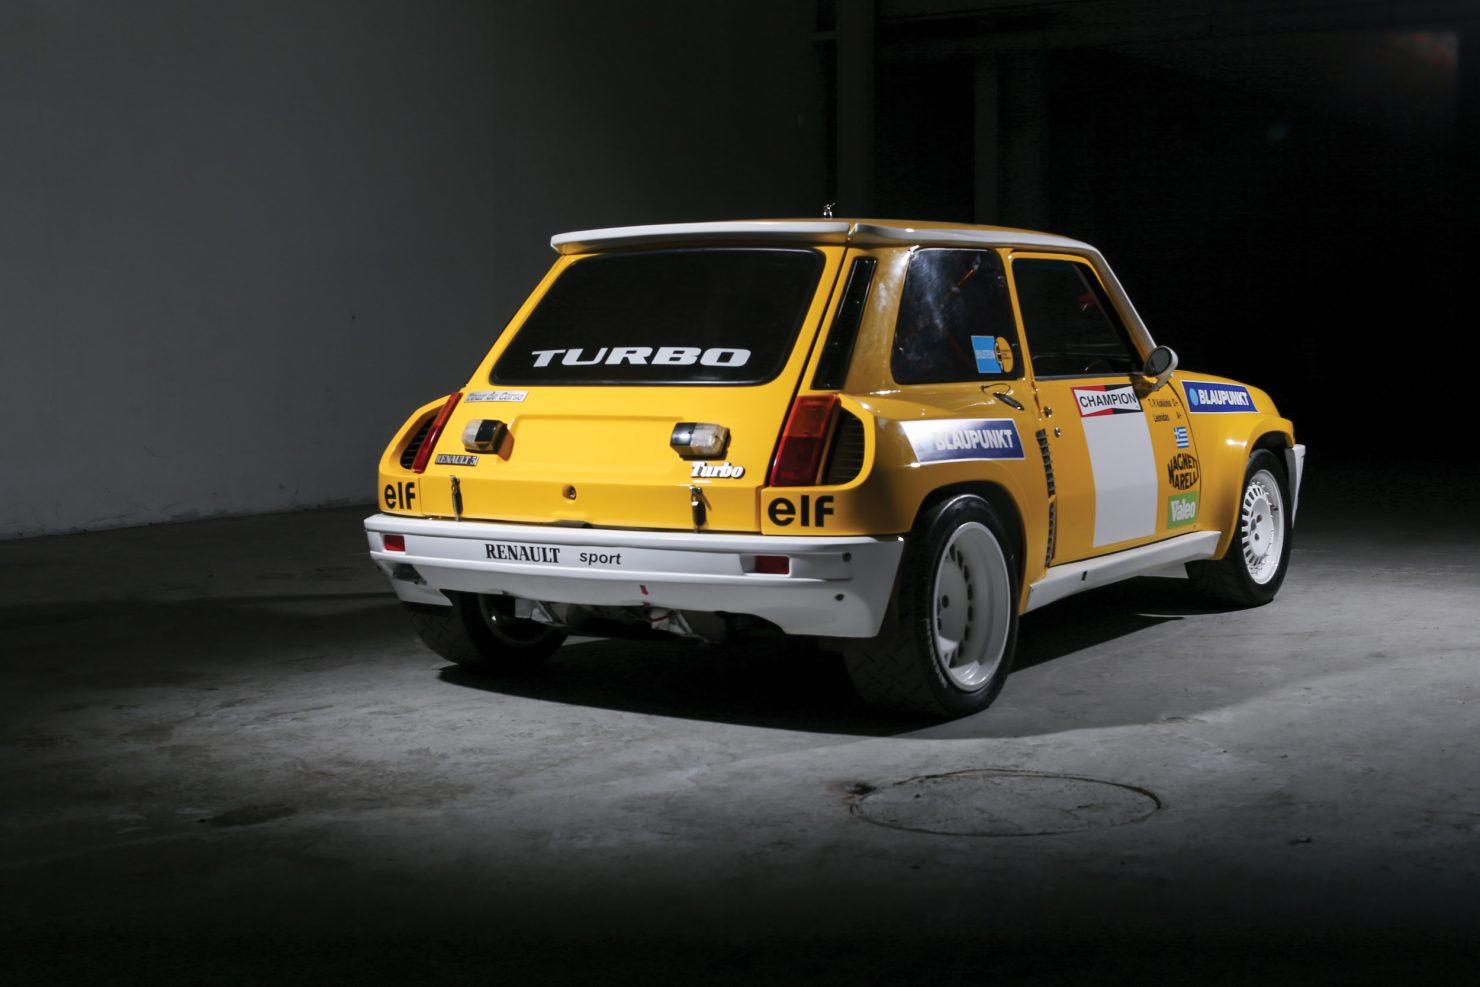 Renault 5 Turbo 11 1480x987 - 1980 Renault 5 Turbo